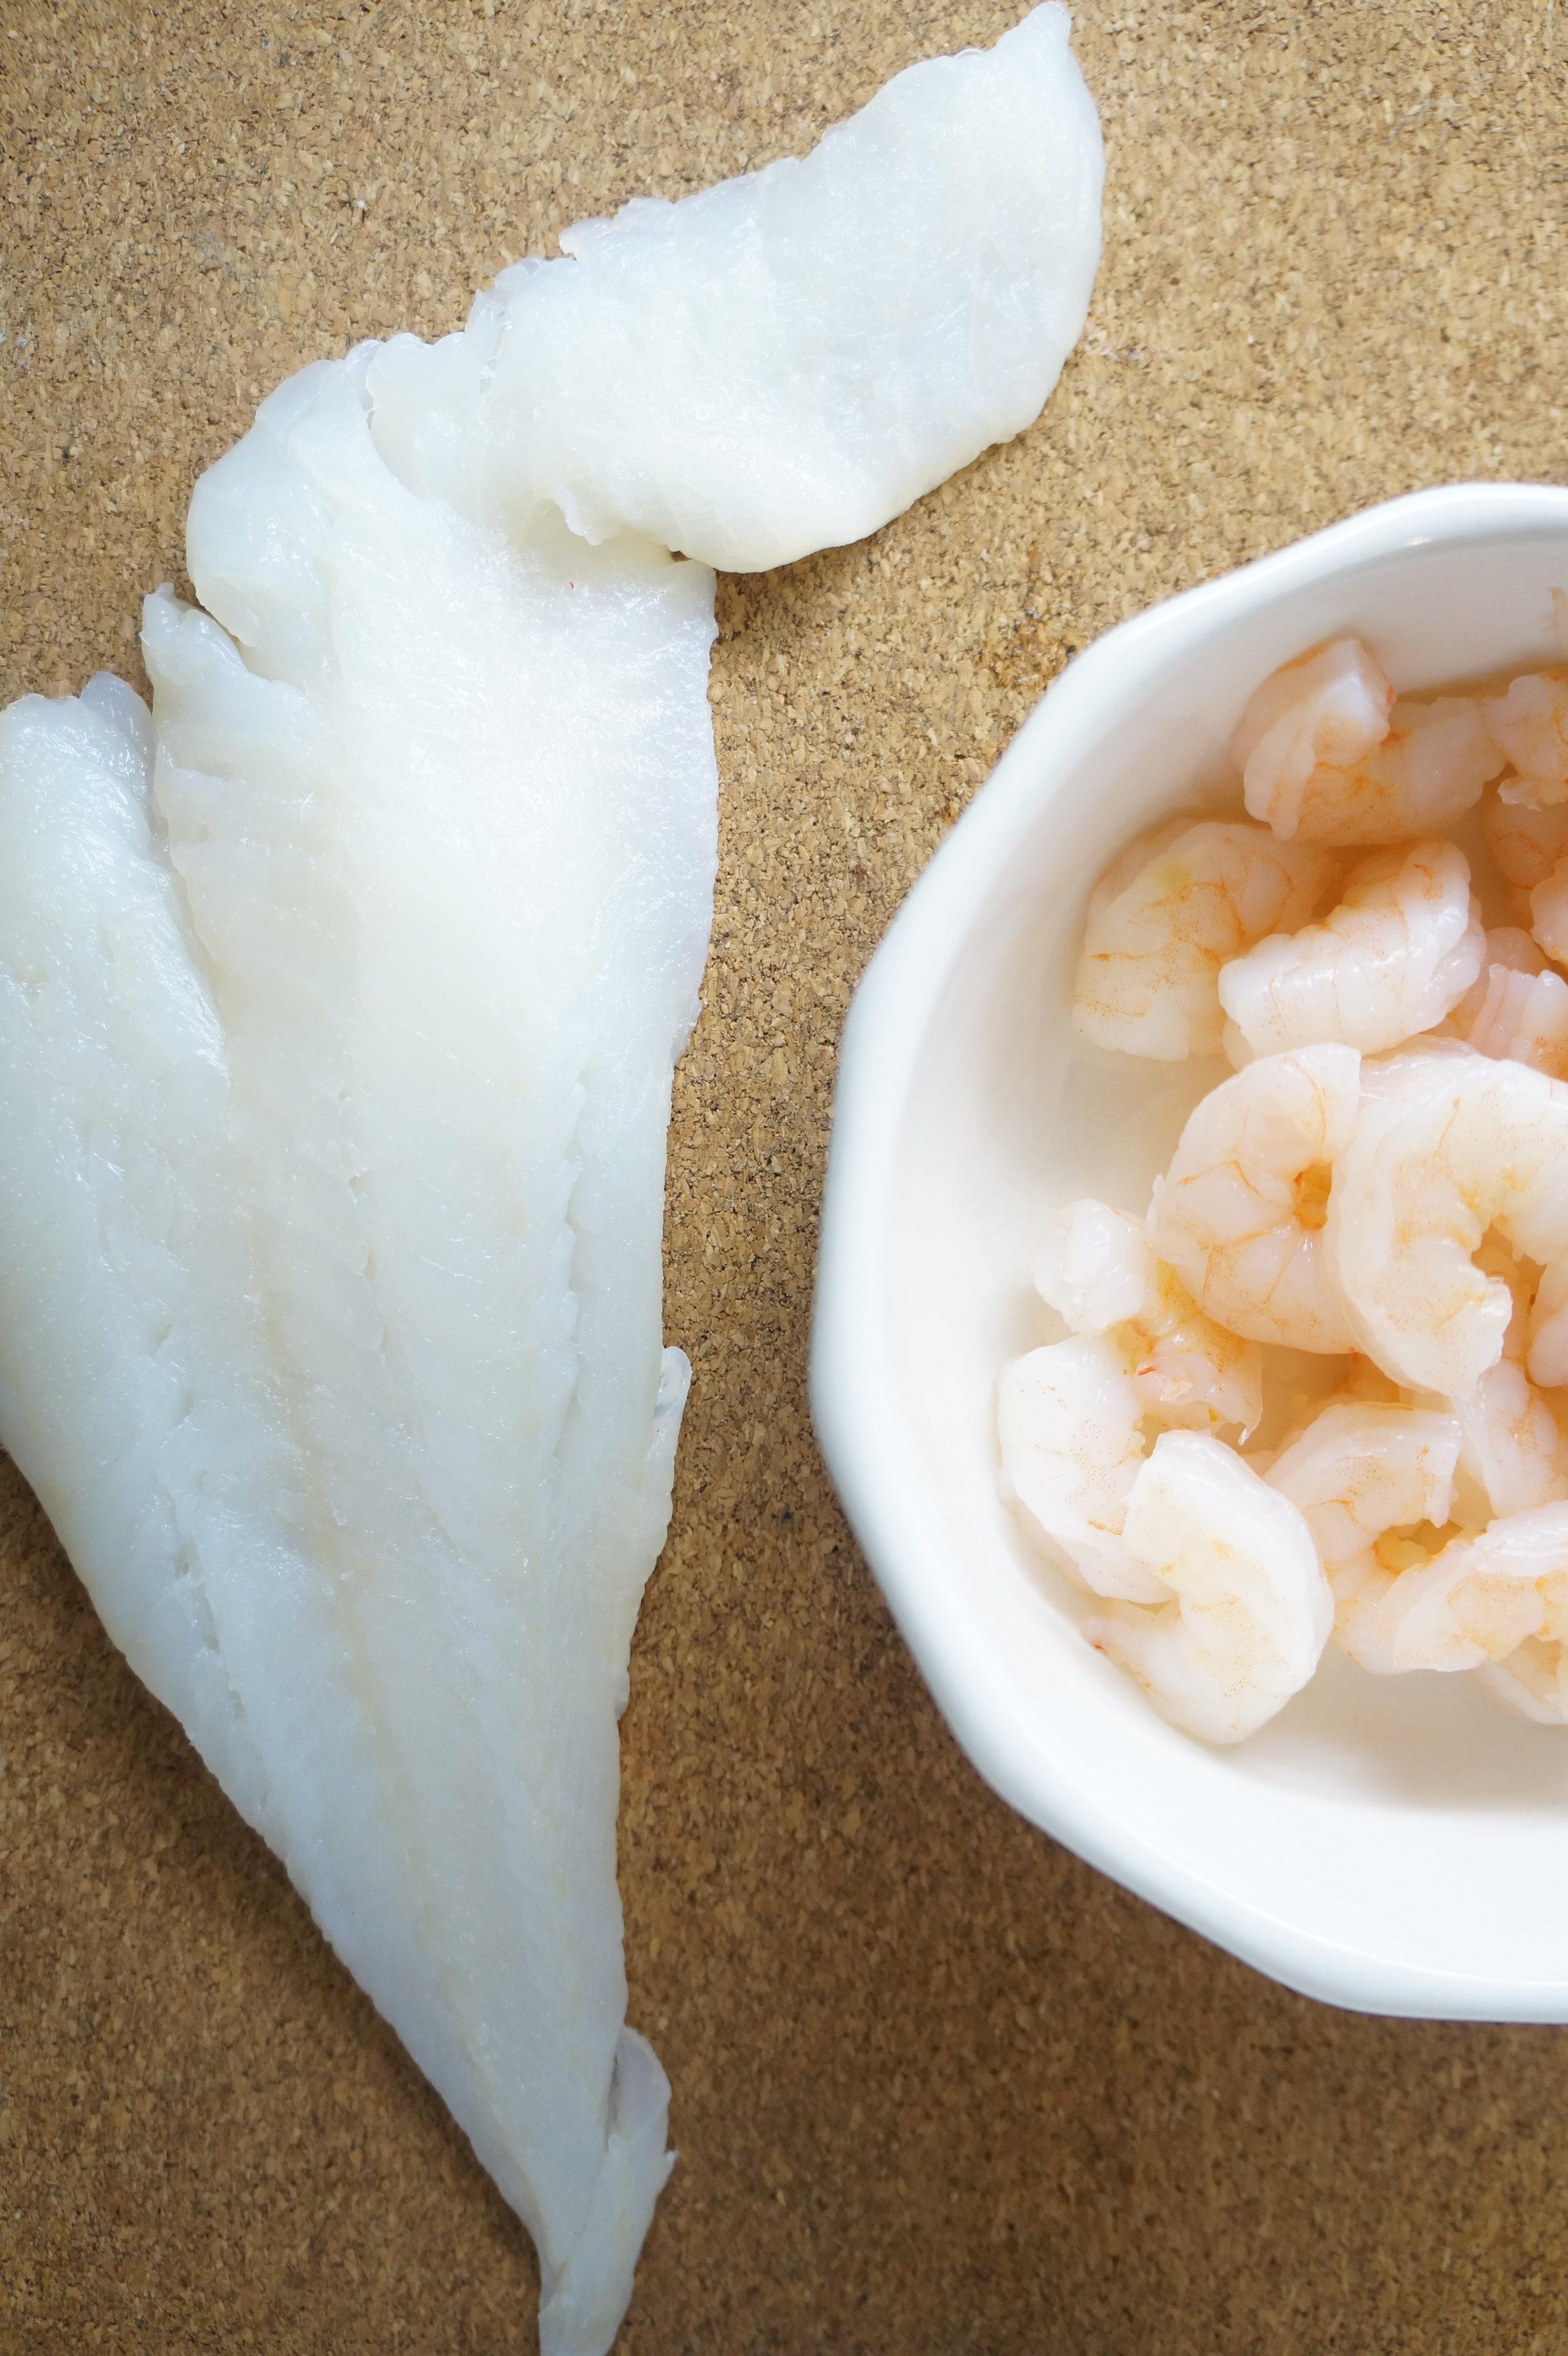 Andrea Fenise Memphis Fashion Blogger shares a shrimp and cod cakes recipe